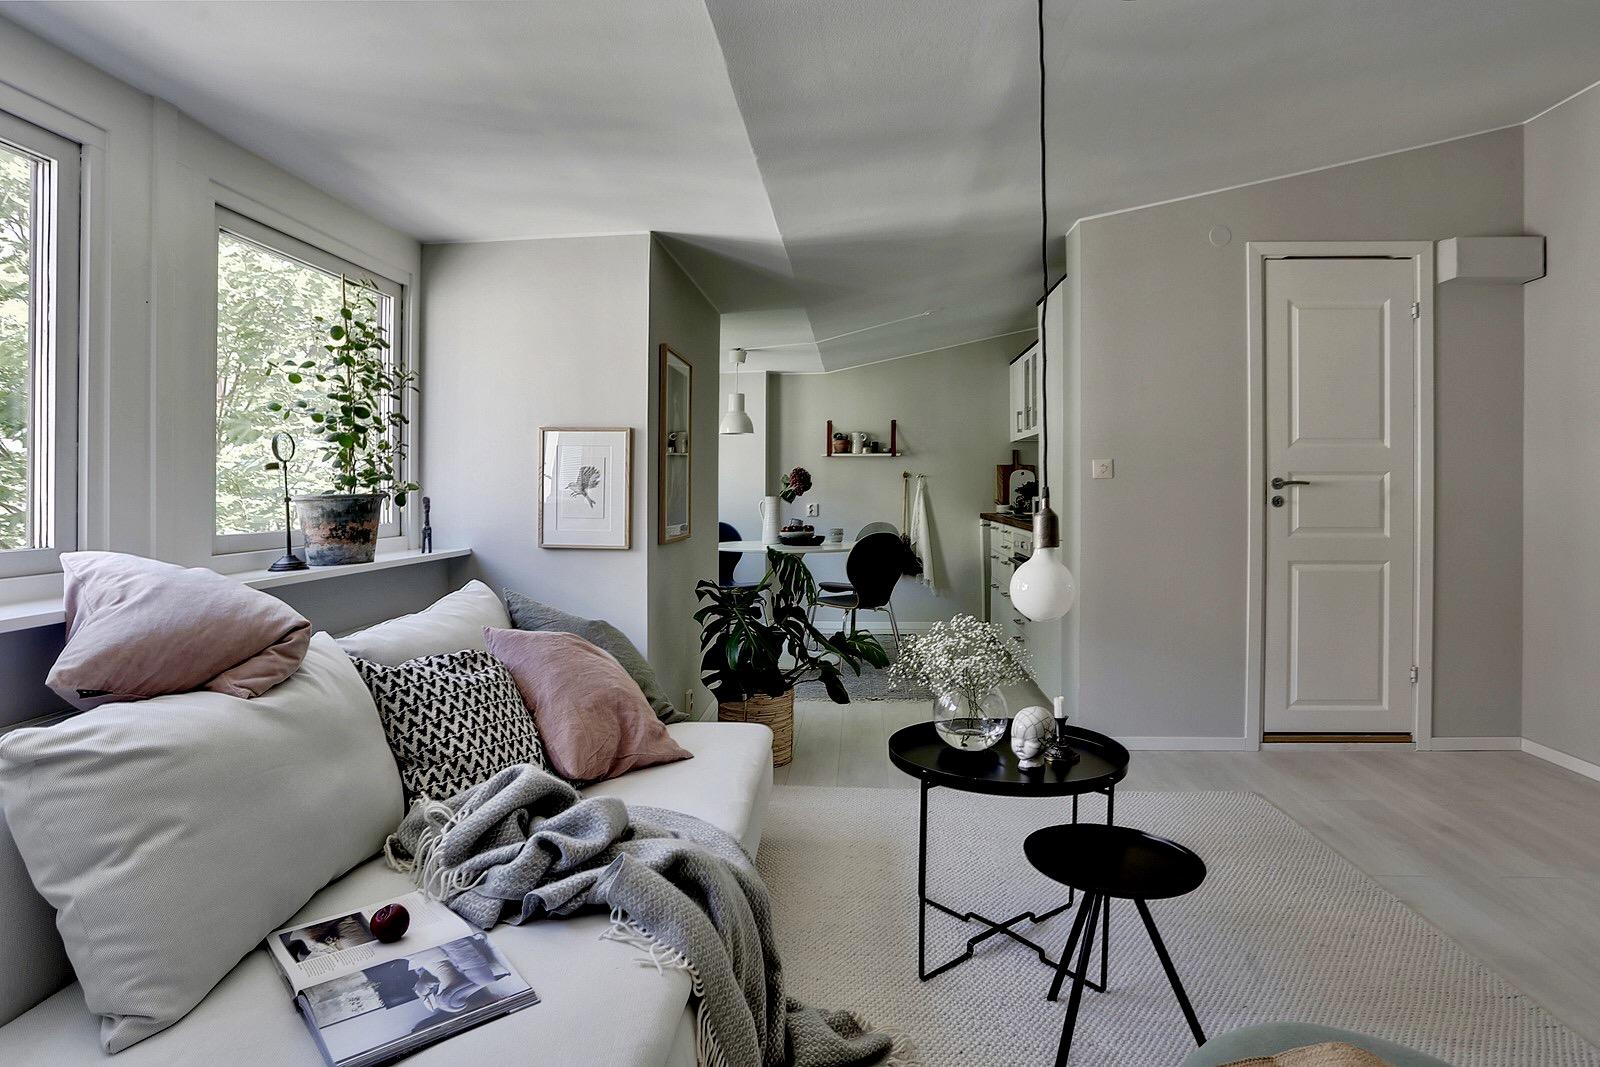 гостиная кухня диван подушки